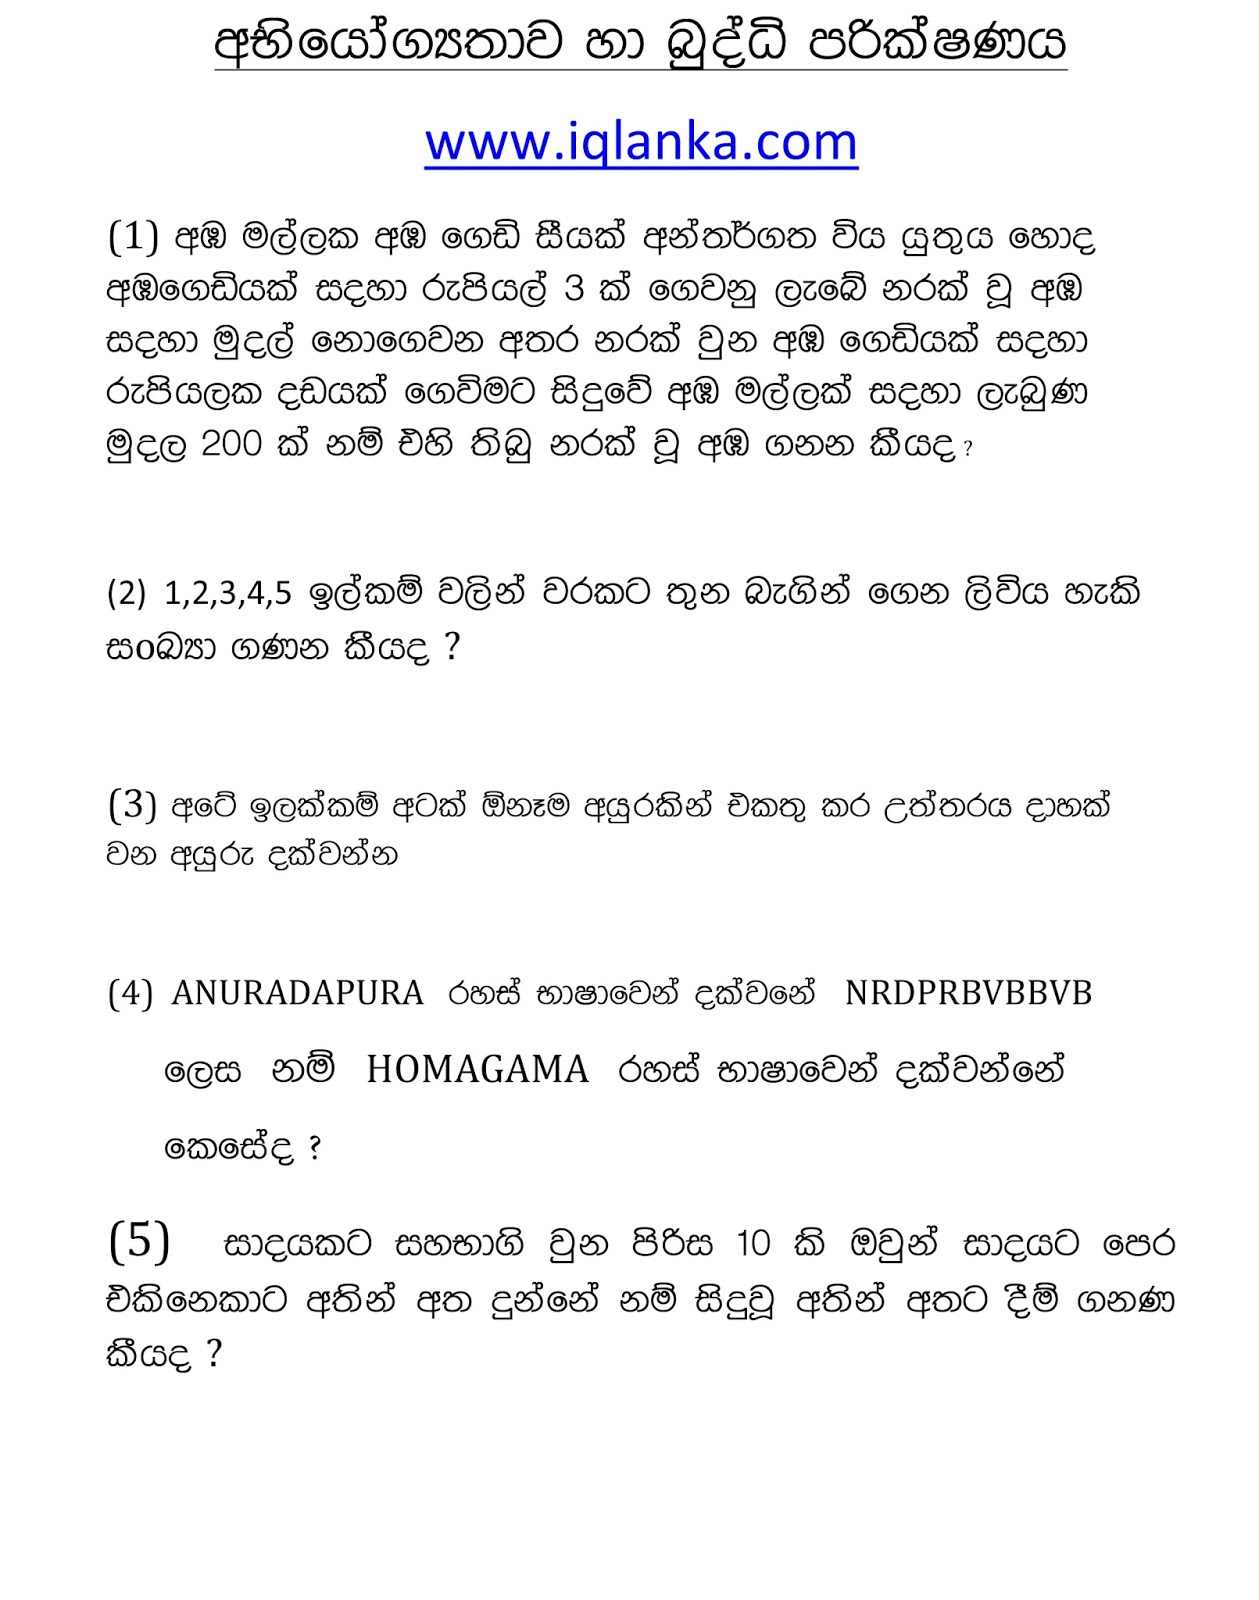 iq paper with answer for sri lankan exam iqlanka com